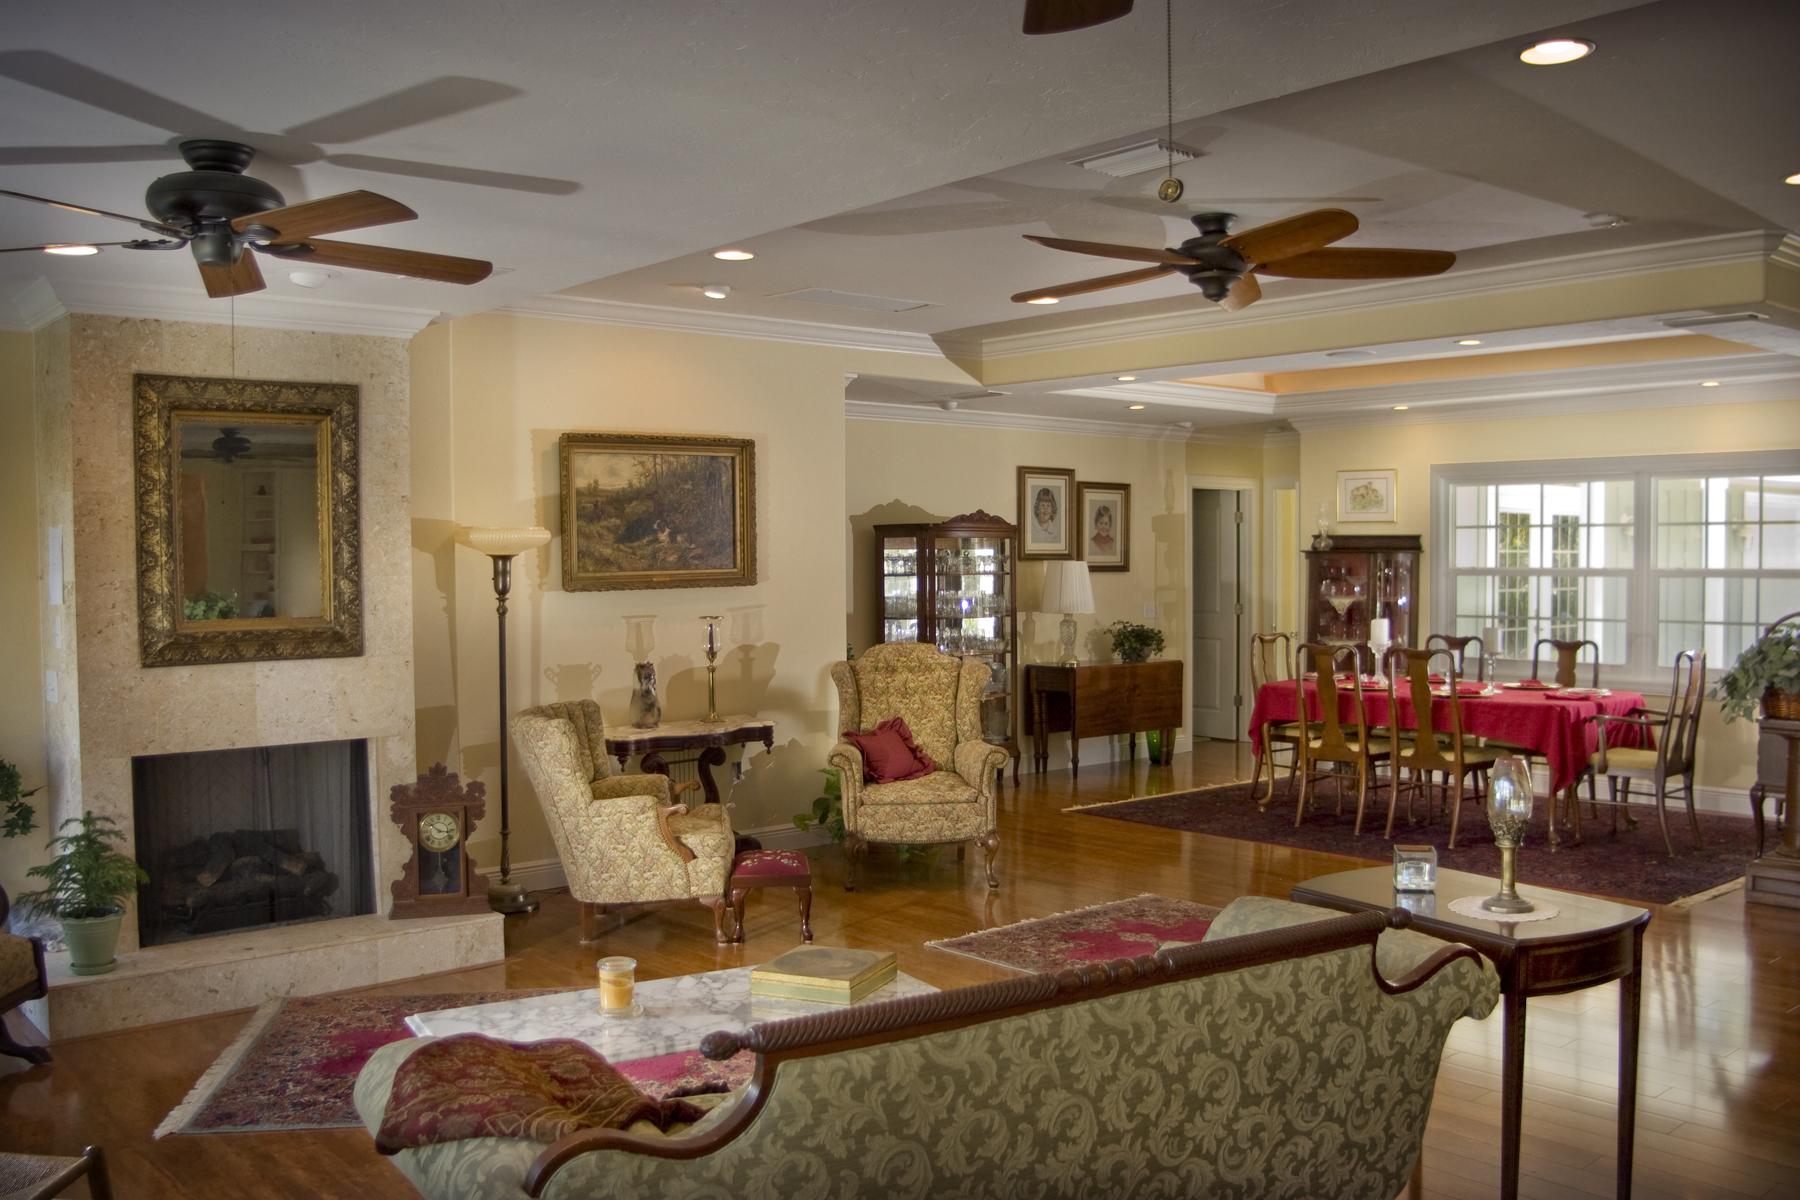 Home Building Carriage House Custom Homes Interiors Inc Part 2